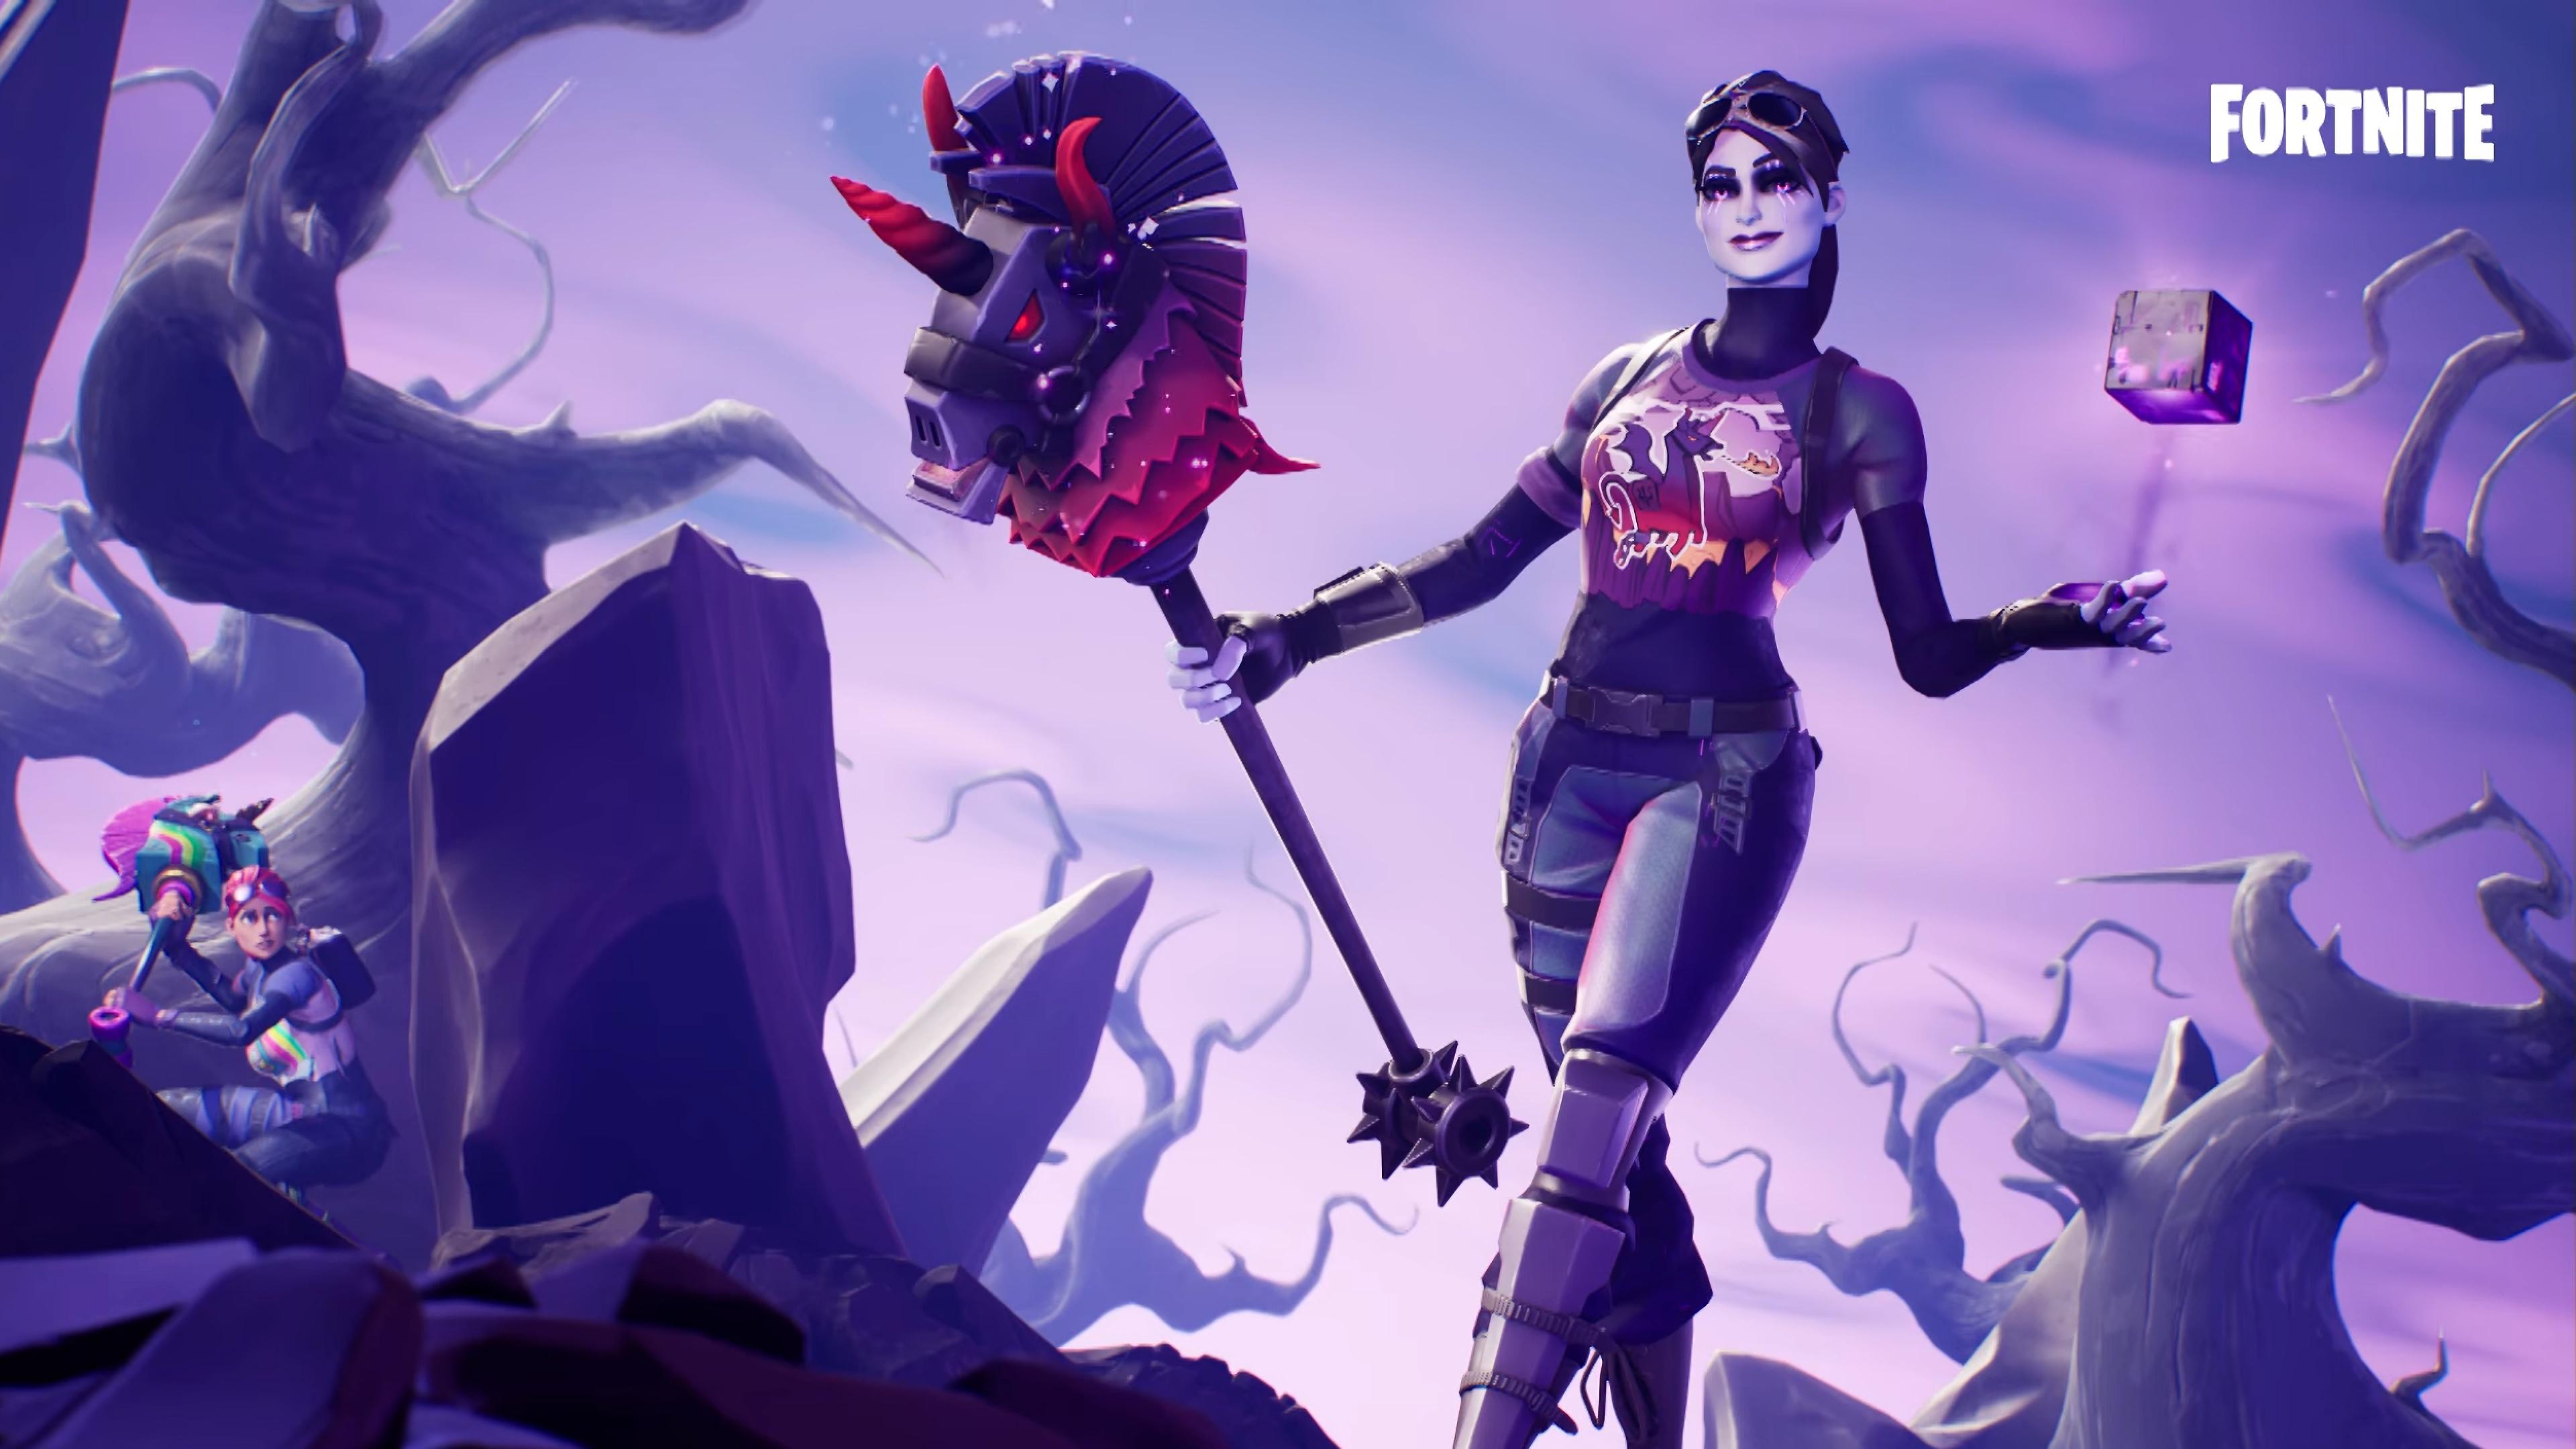 Dark Bomber Fortnite Season 6 4k Hd Games 4k Wallpapers Images